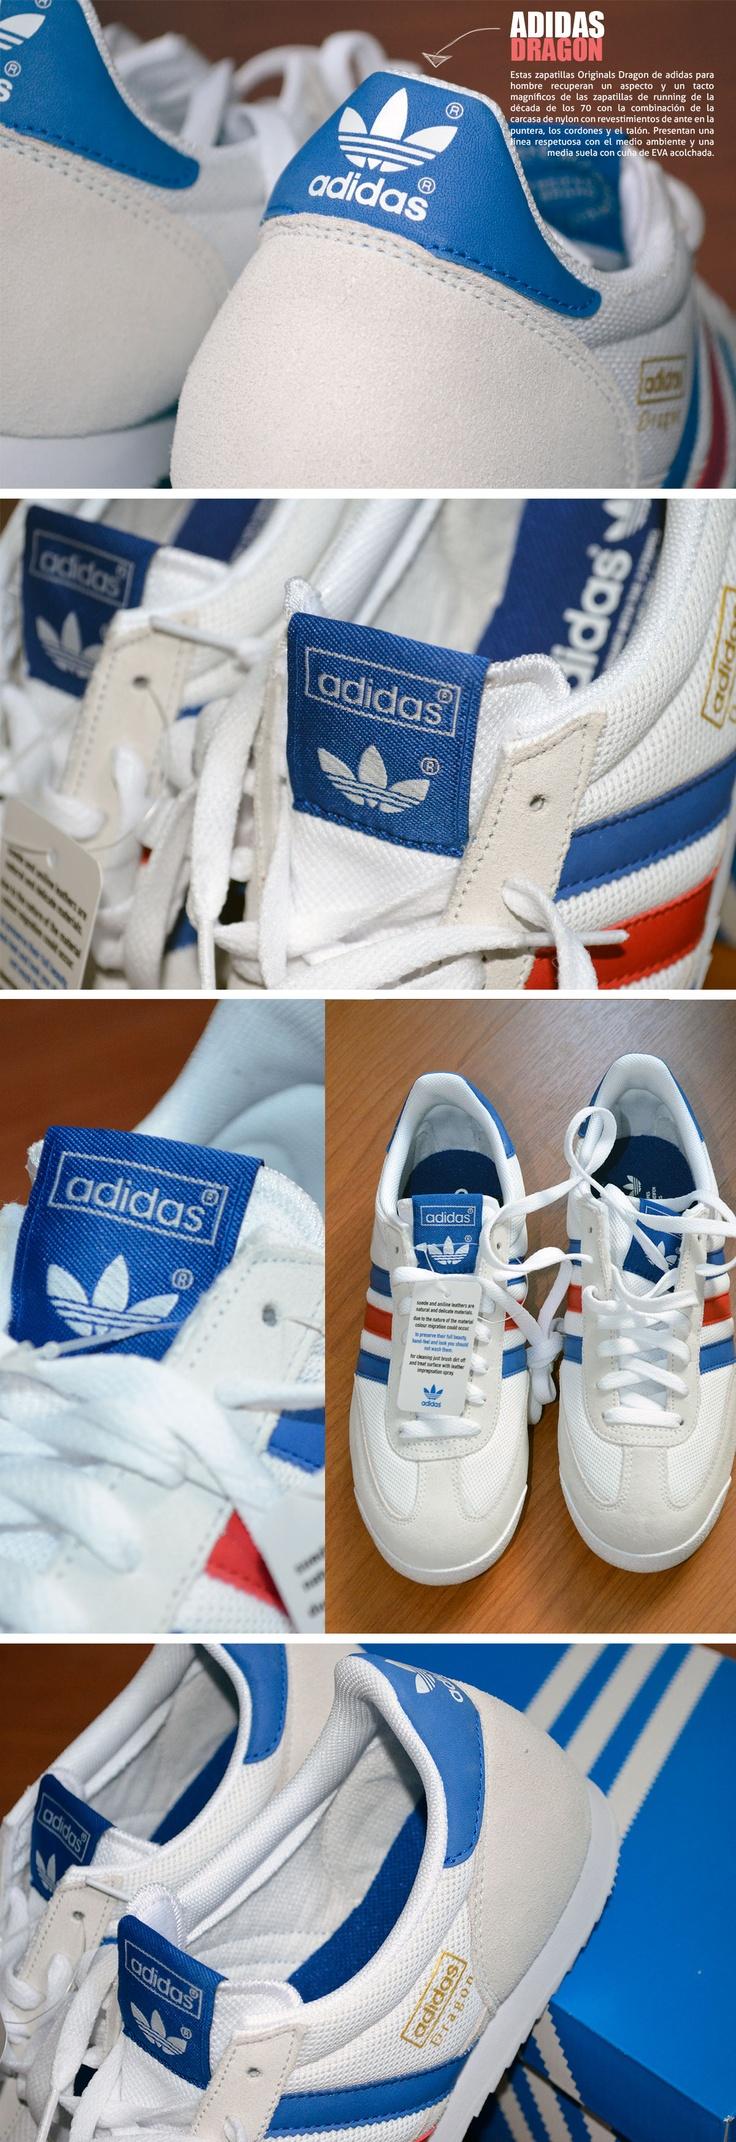 meet 946ef 60e91 Tennis Adidas Dragon  tennis  adidas  sport  sportwear  casual  fashion